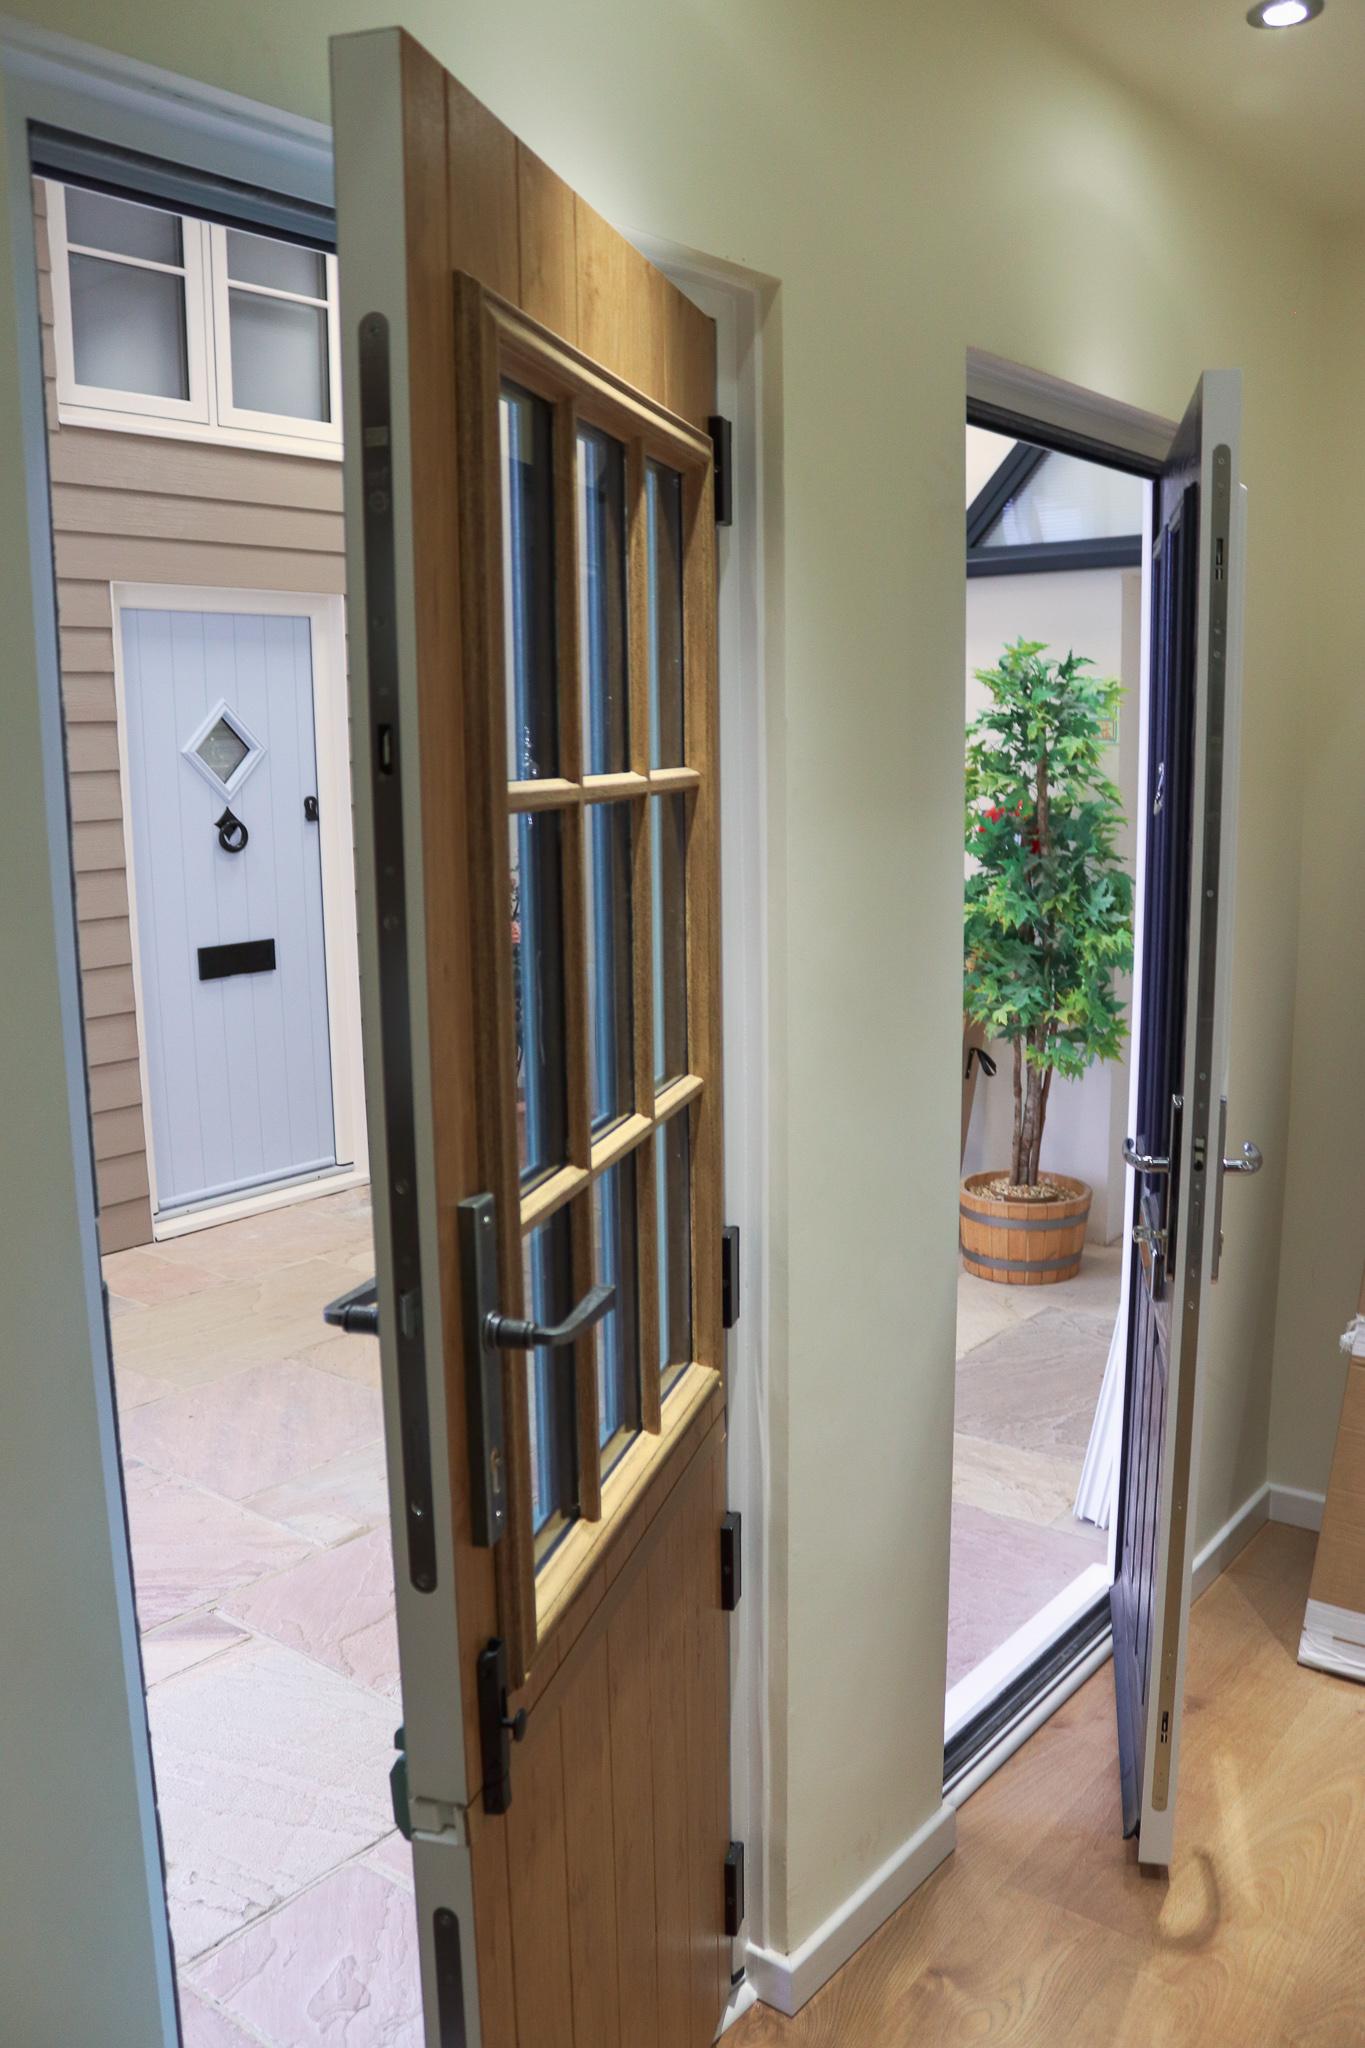 Image of new door installation by 21st Century.